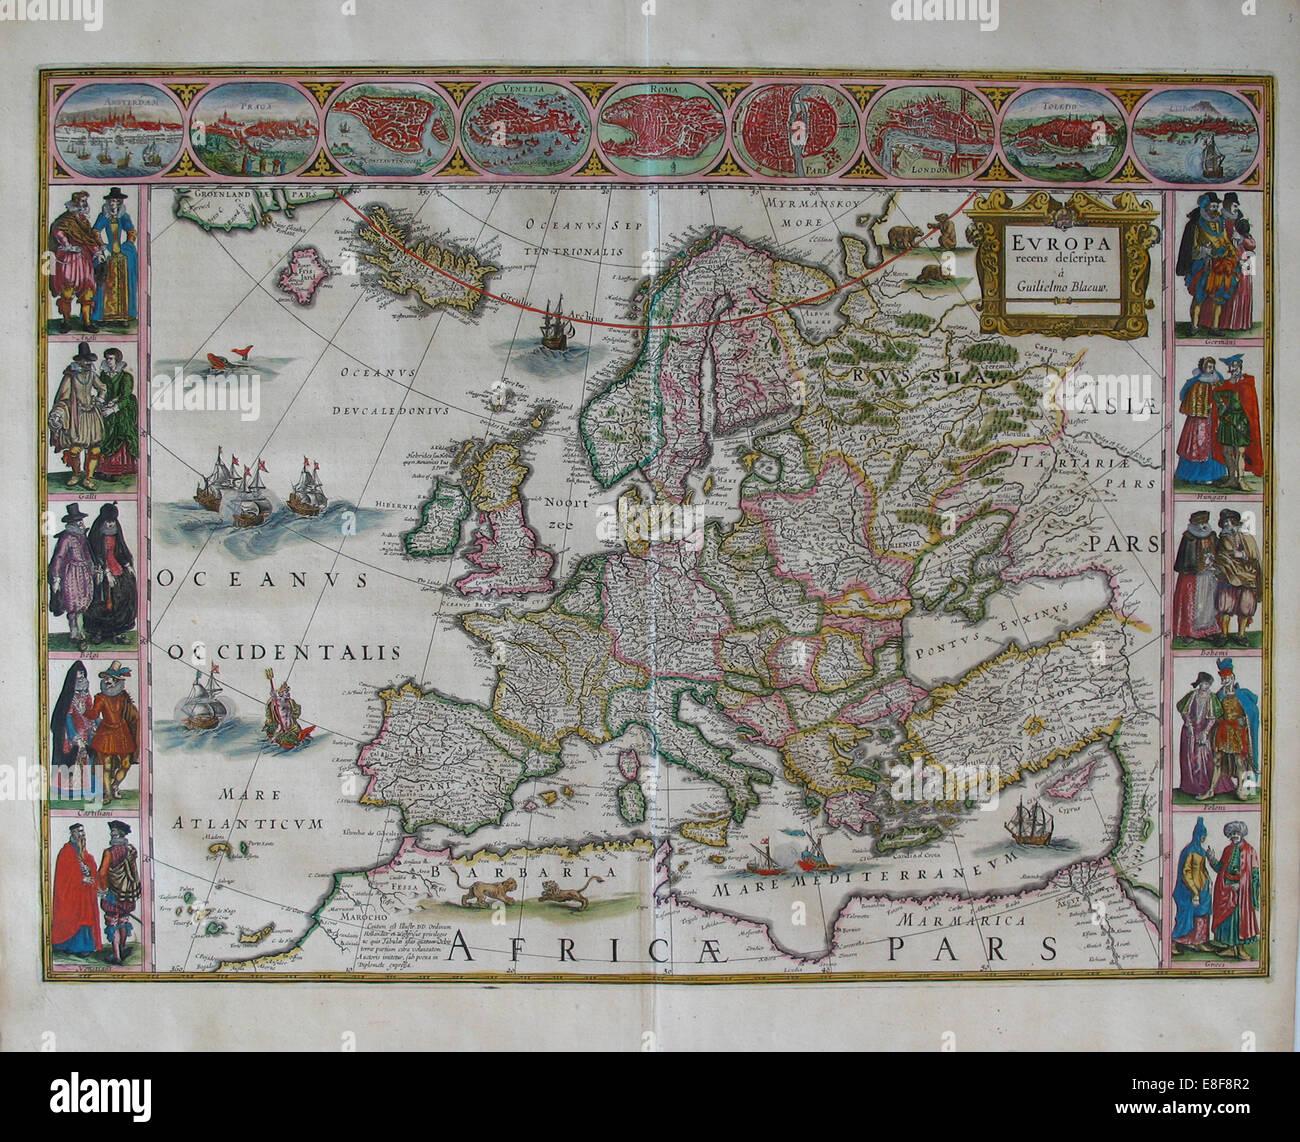 Europakarte (aus: Atlas Maior). Künstler: Blaeu, Joan (1596-1673) Stockbild